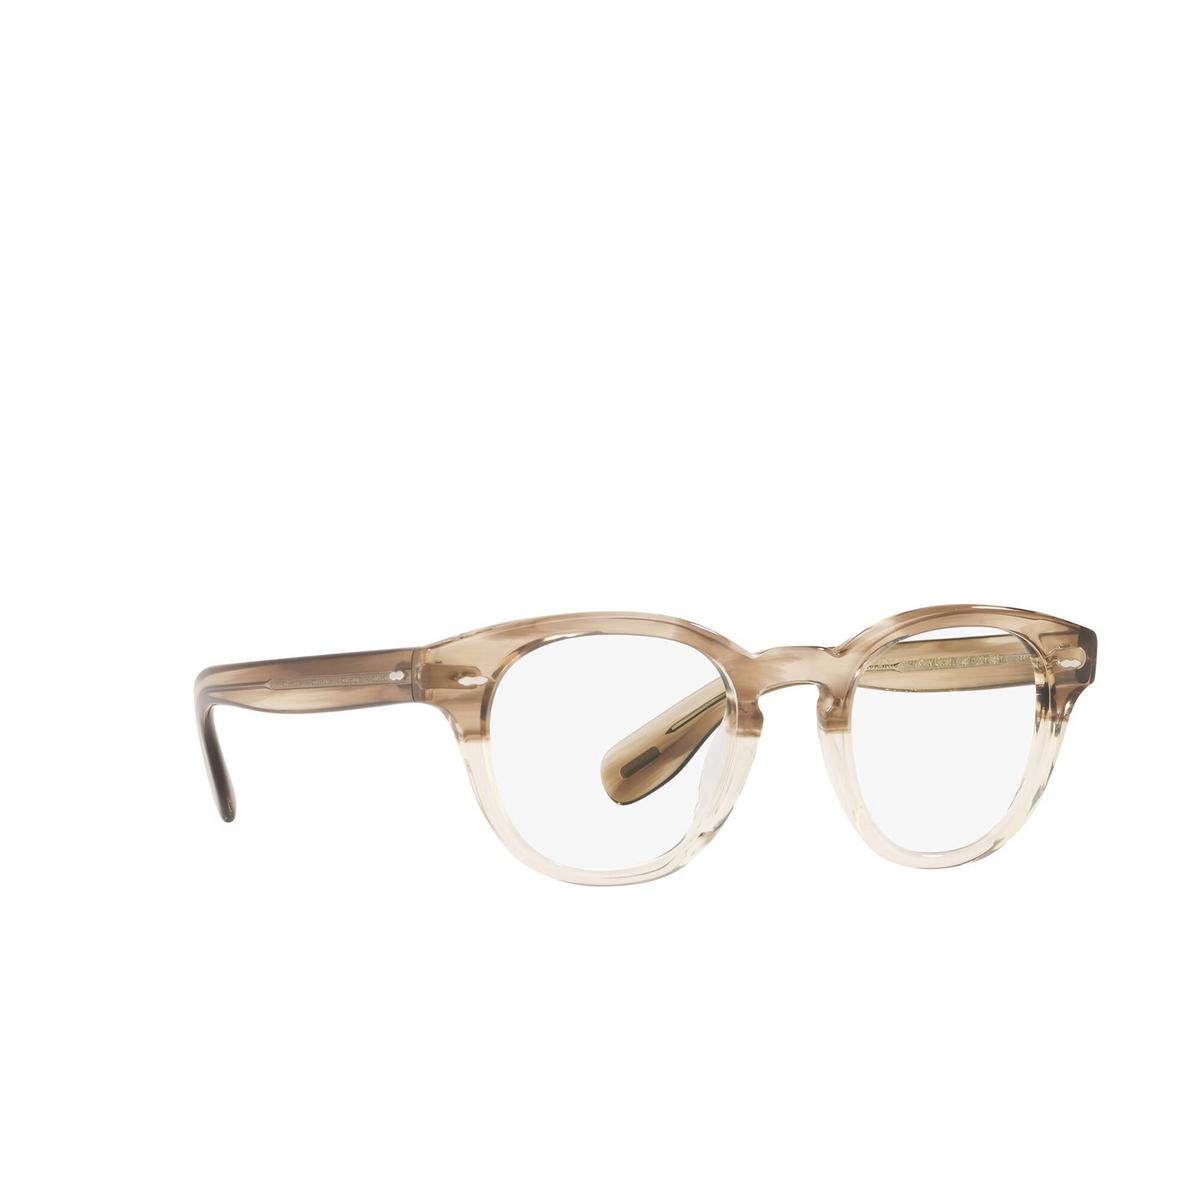 Oliver Peoples® Square Eyeglasses: Cary Grant OV5413U color Military Vsb 1647 - three-quarters view.